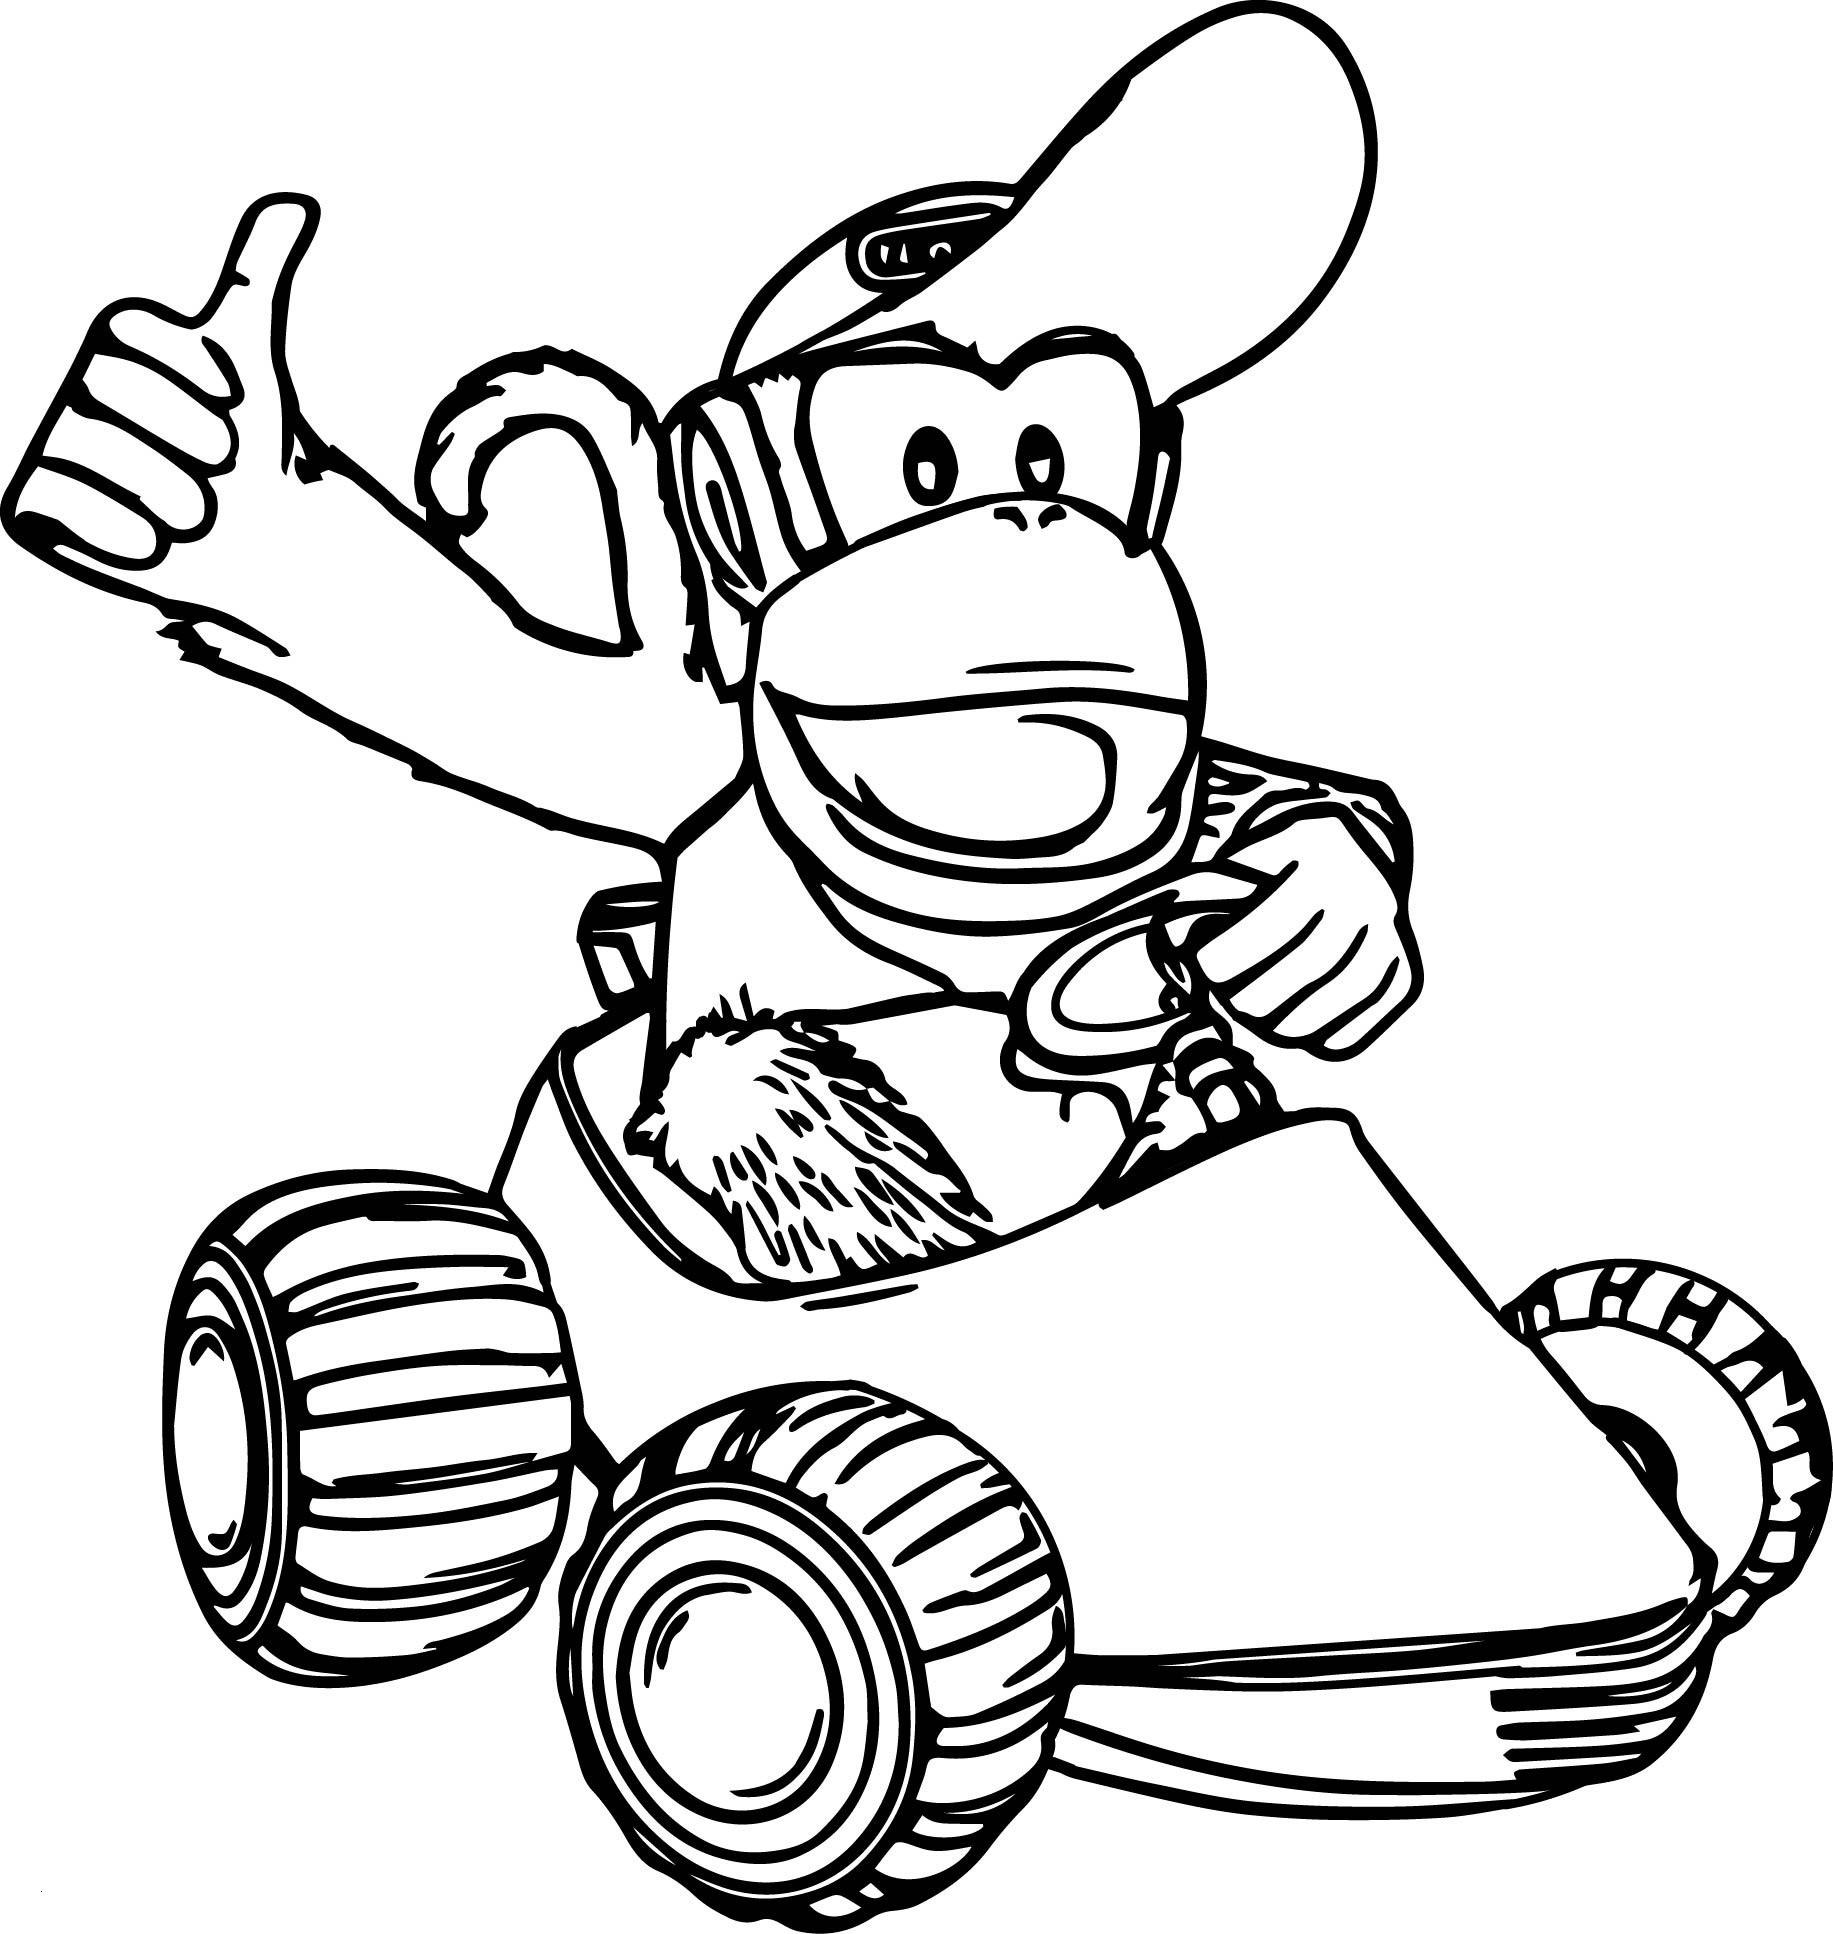 Ausmalbild Super Mario Einzigartig Ausmalbilder Mario Kart 8 Uploadertalk Best Ausmalbilder Super Bild